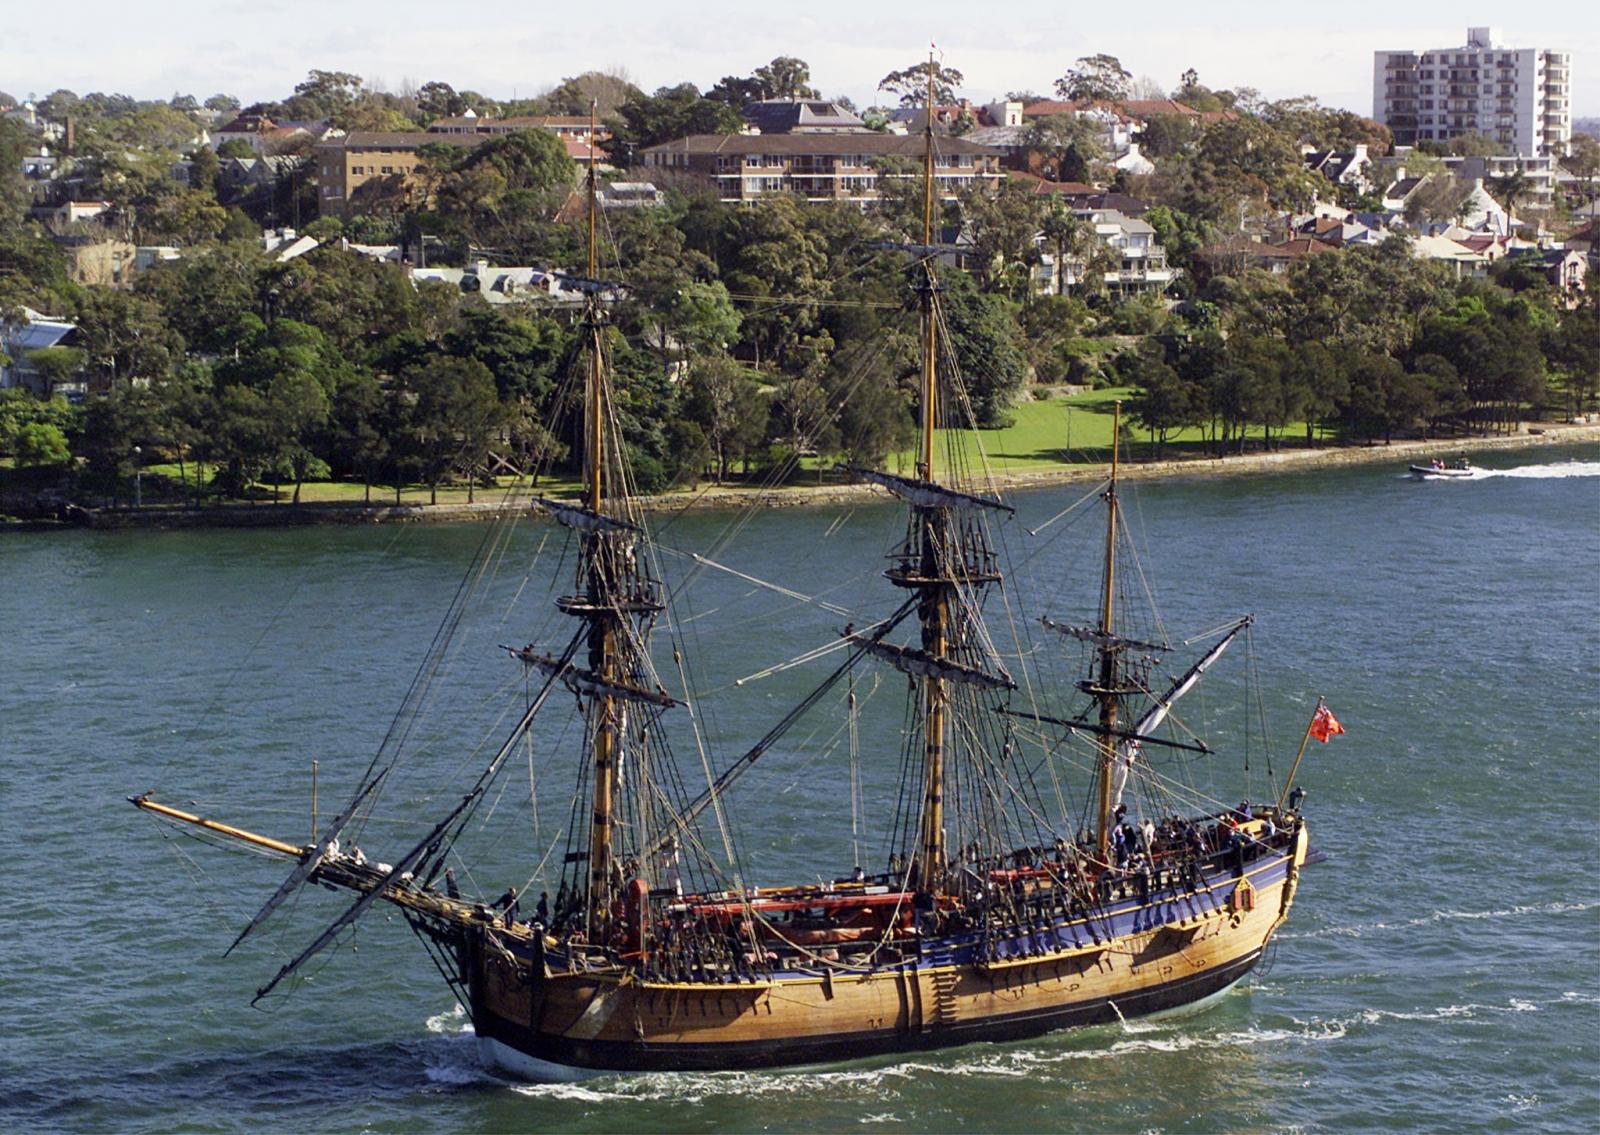 HMS Endeavour Replica